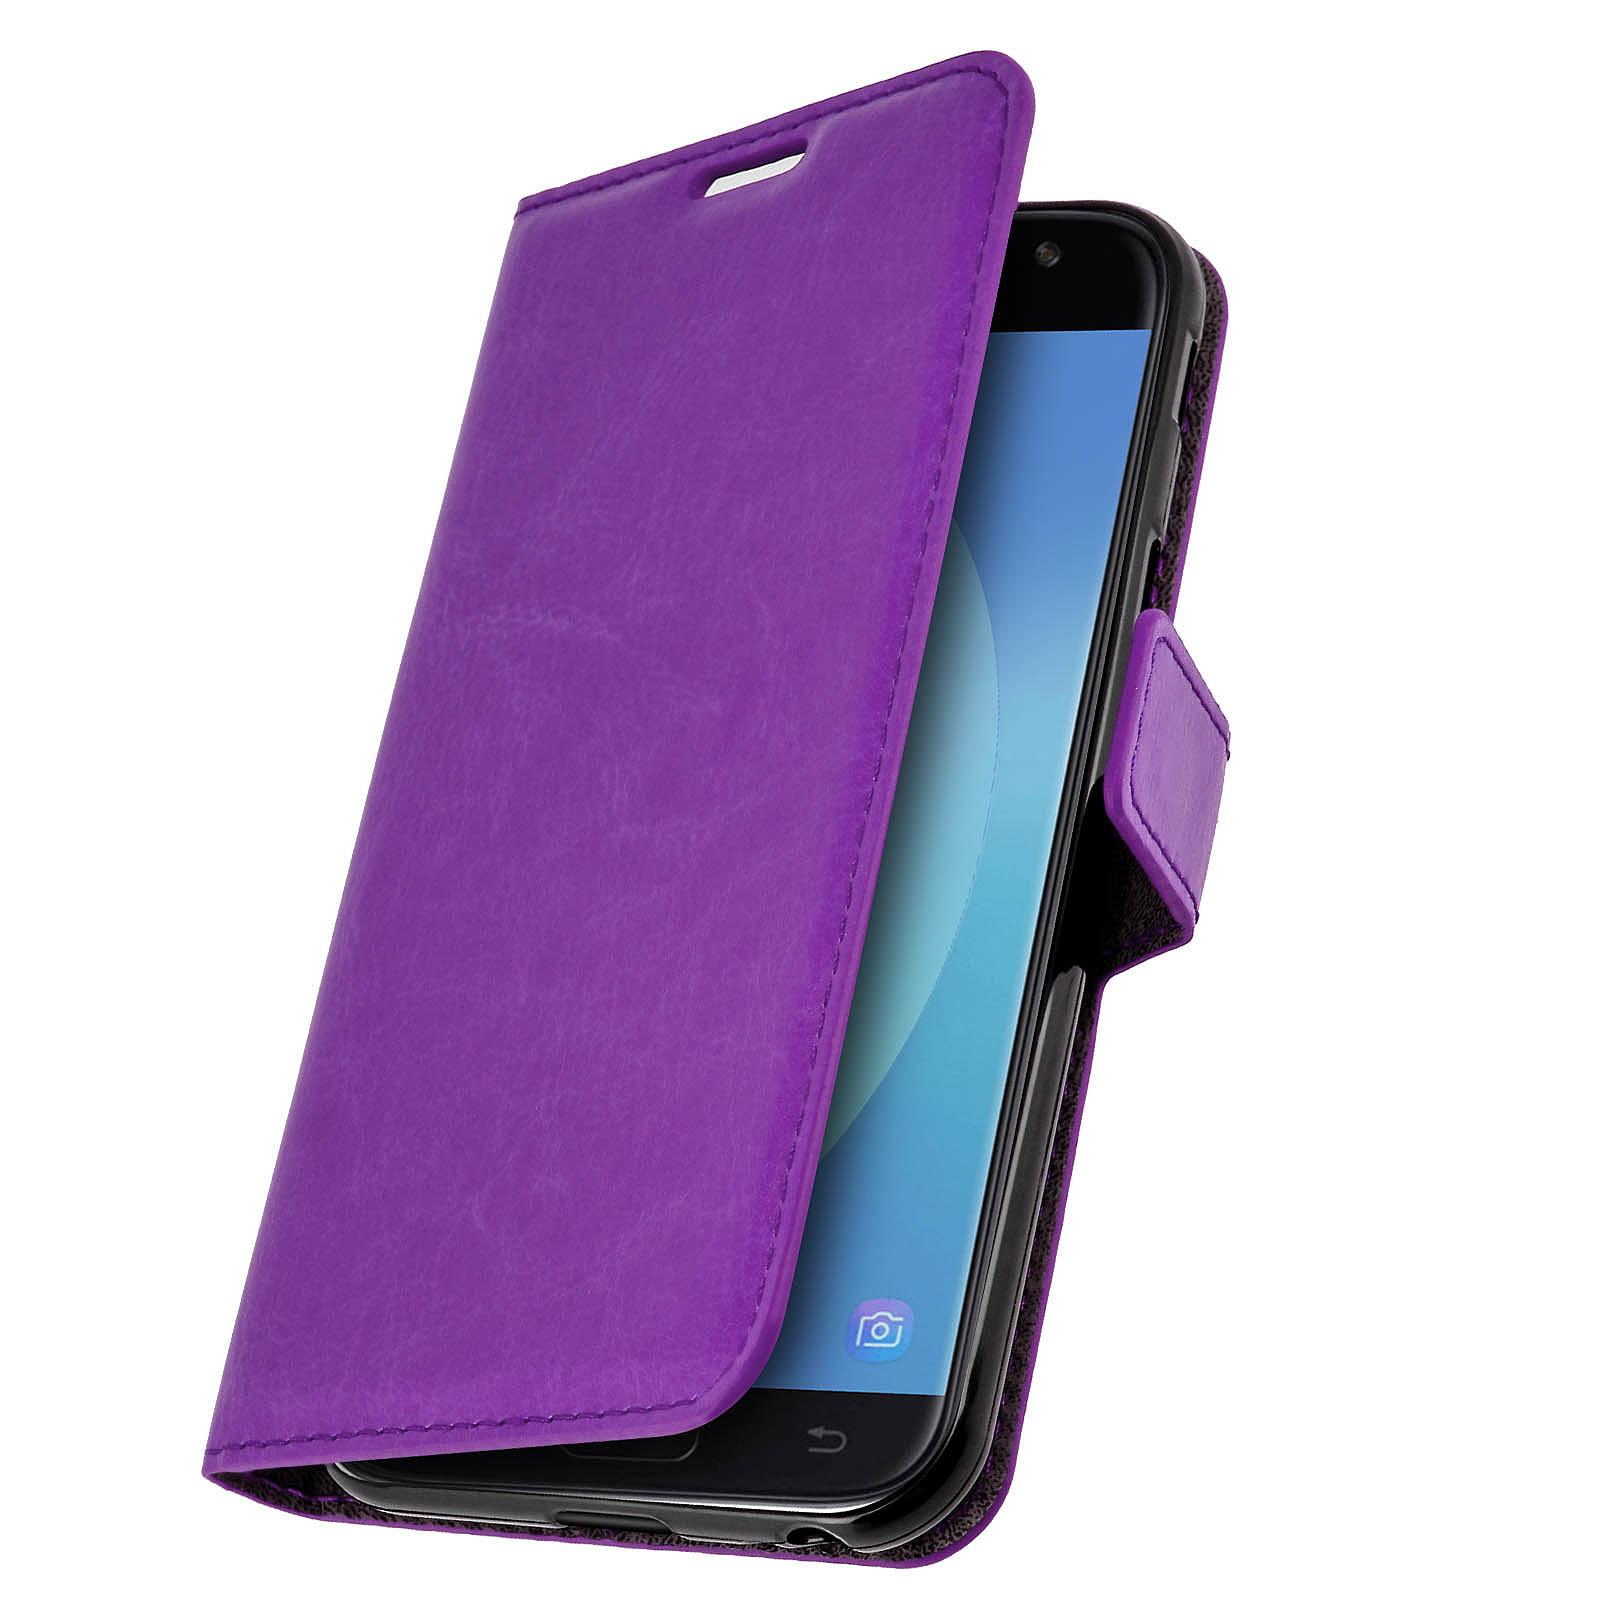 Avizar Etui folio Violet pour Samsung Galaxy J3 2017